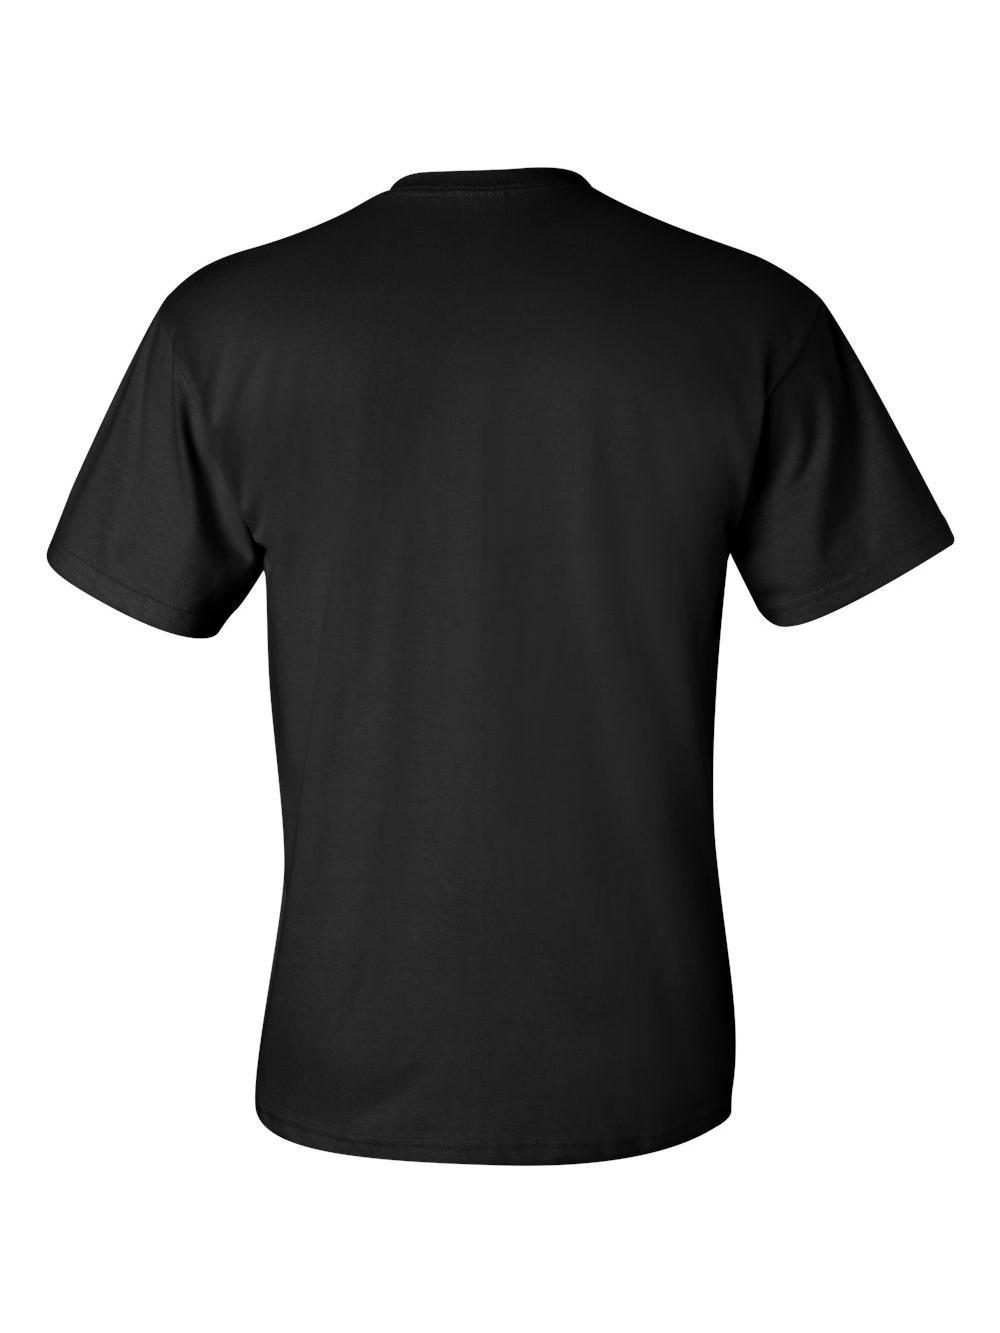 Gildan-Ultra-Cotton-T-Shirt-with-a-Pocket-2300 thumbnail 7